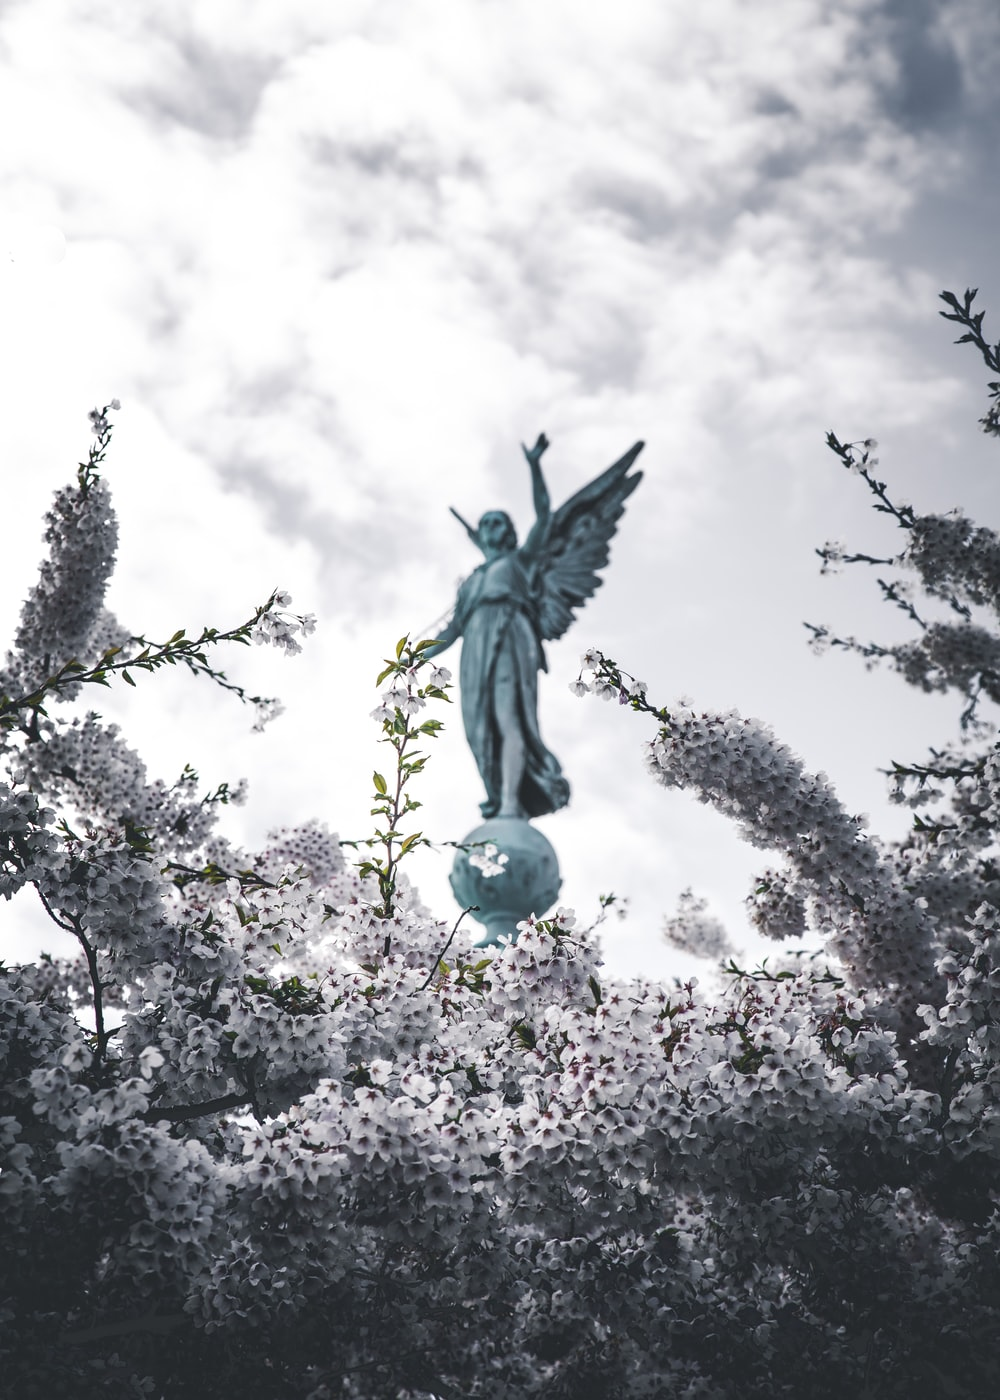 angel green concrete statue low-angle photo